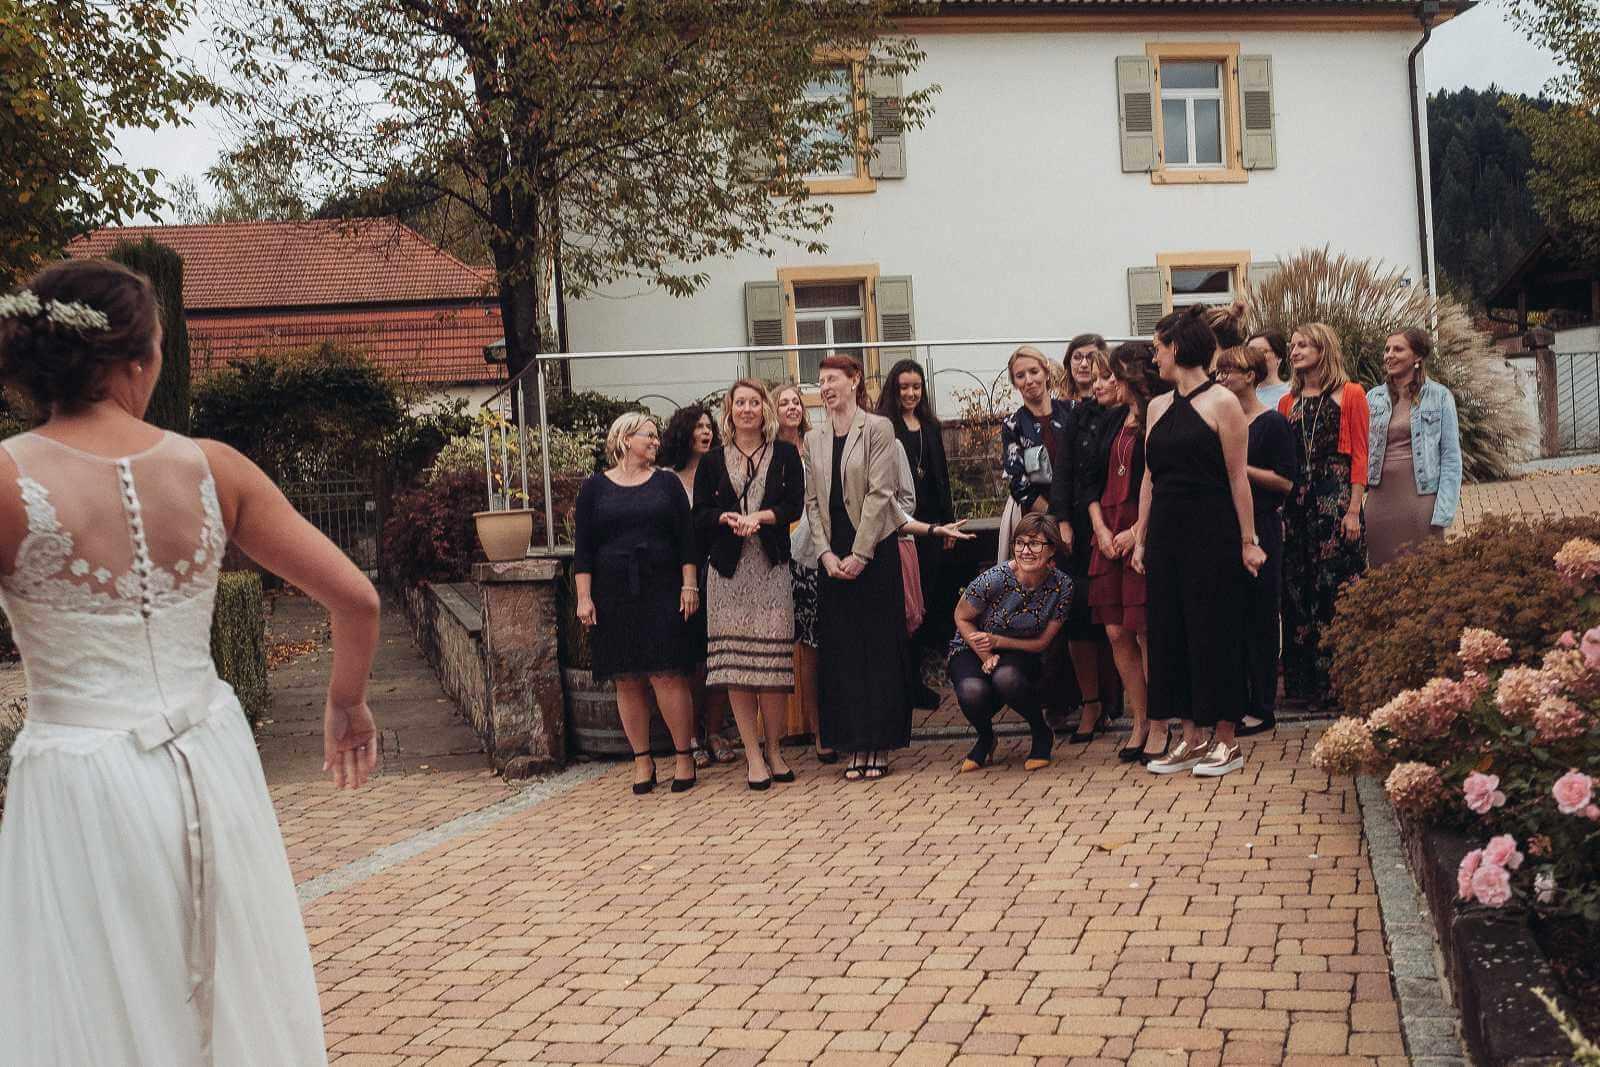 Hochzeitsfotograf Offenburg Zell am Harmersbach Bärenkeller (56)